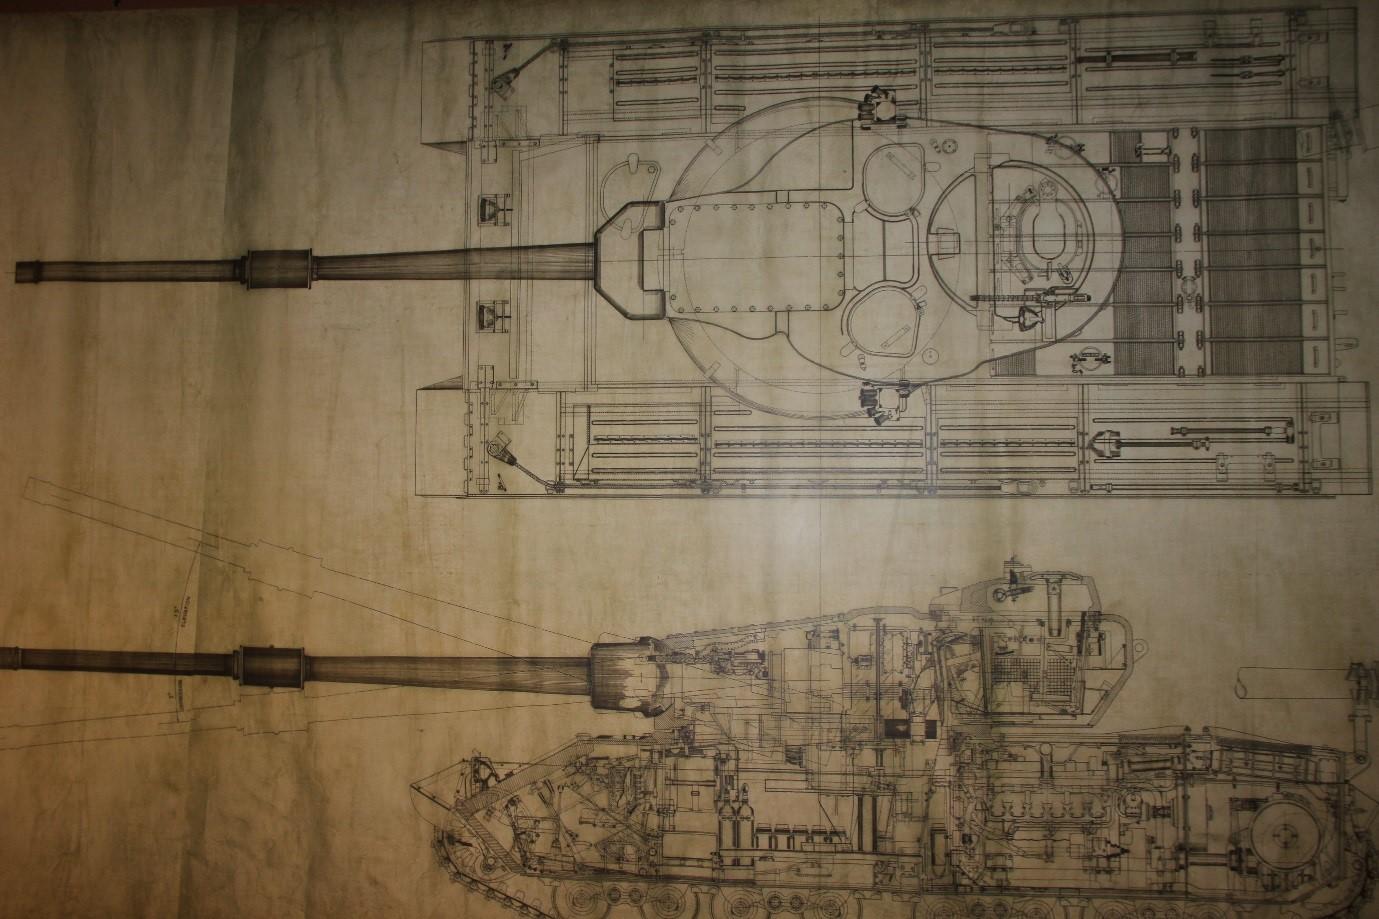 http://static-ptl-eu.gcdn.co/dcont/fb/image/bovington_tank_factory_8.jpg